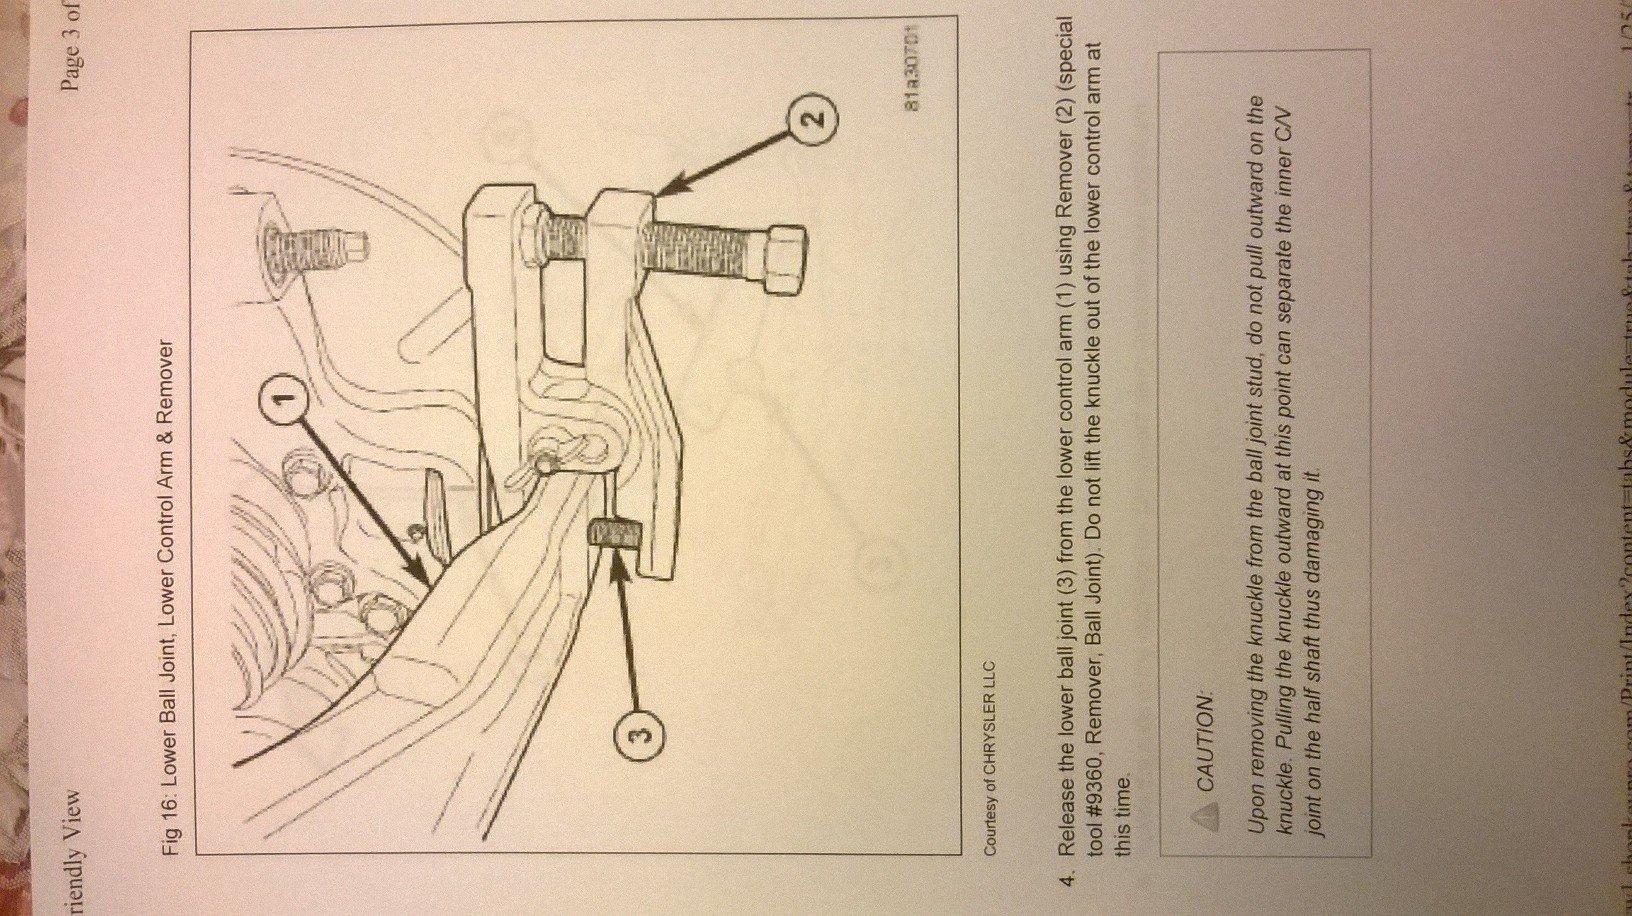 Lower Control Arm